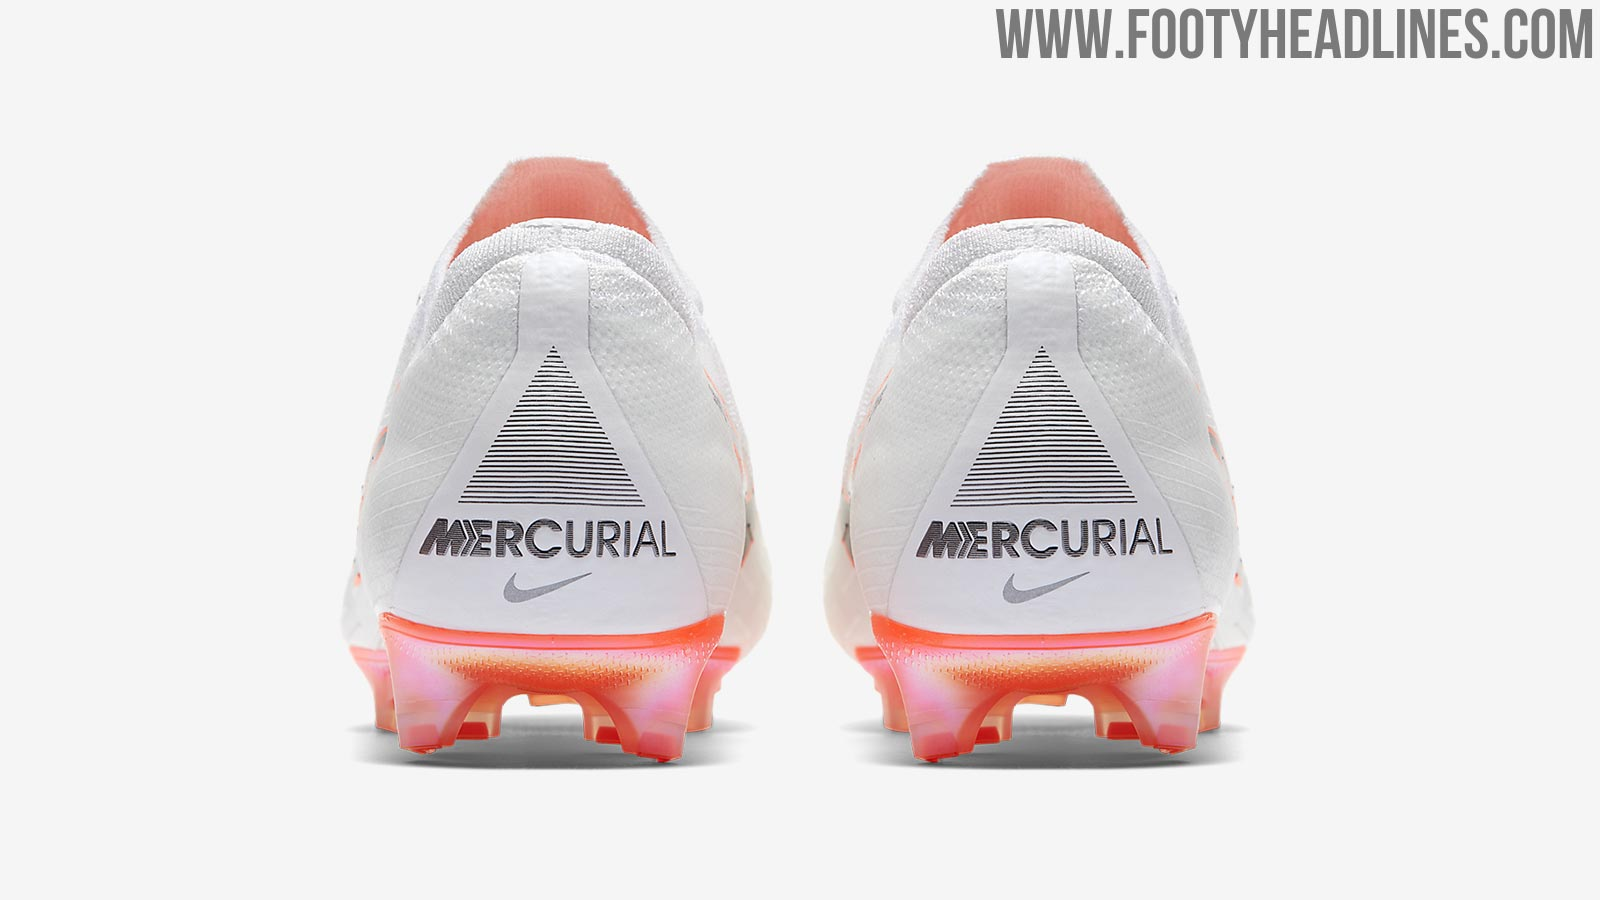 d0efdb23d Nike Mercurial Vapor 12 Elite 2018 World Cup Boots Revealed